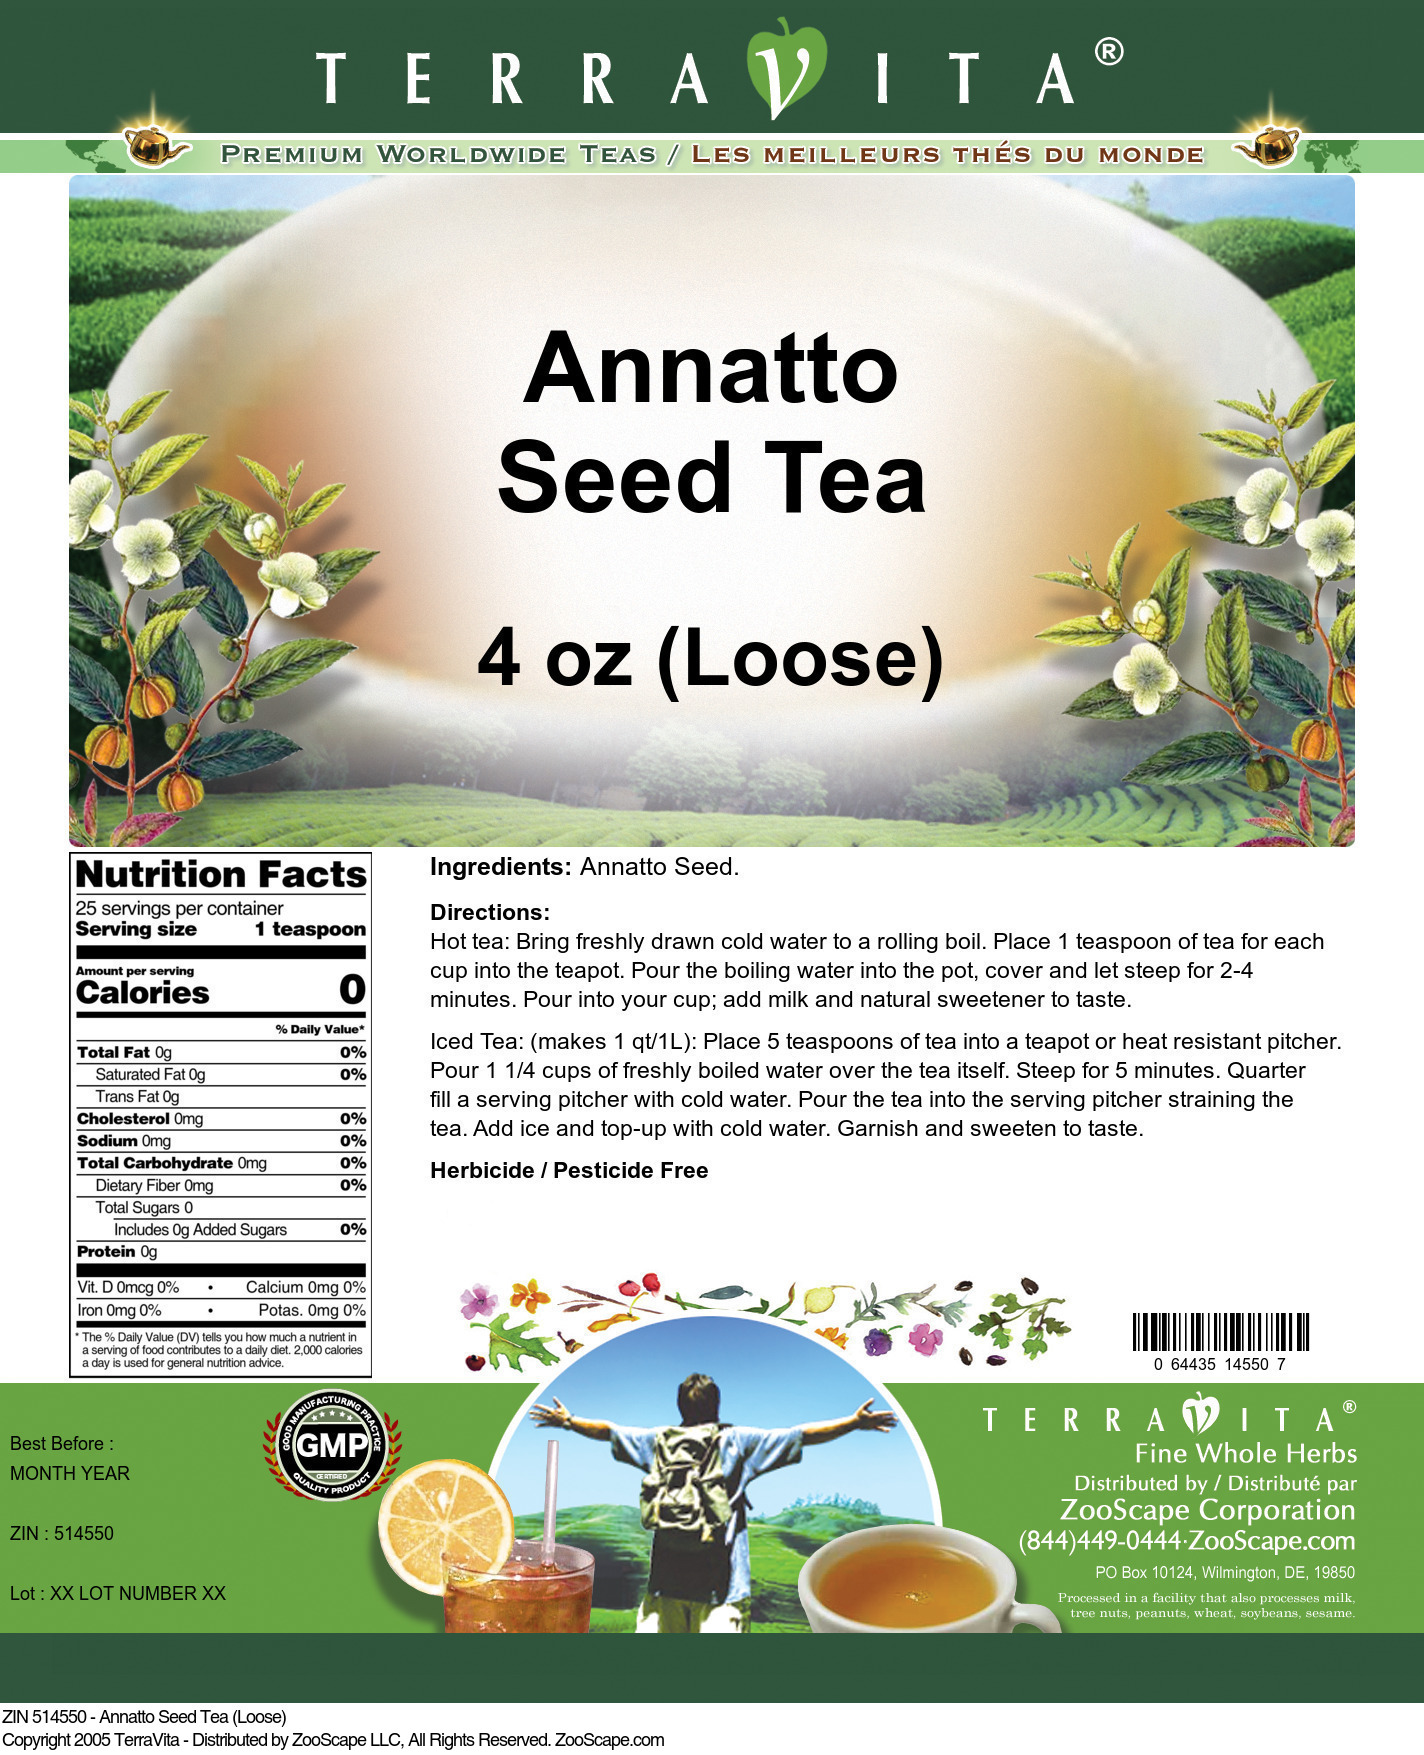 Annatto Seed Tea (Loose)